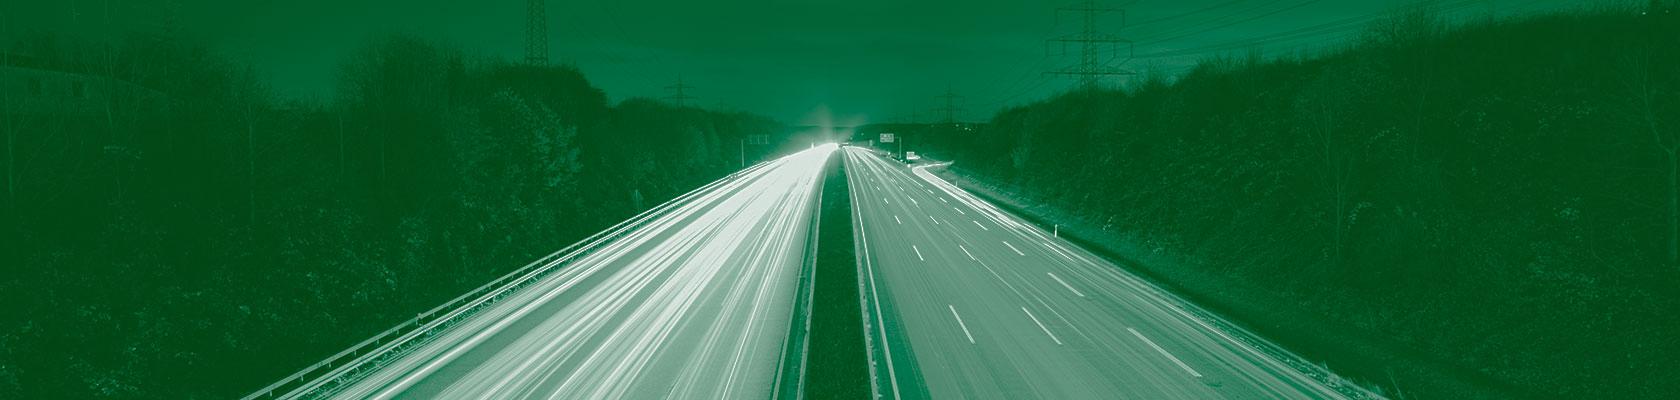 trasporti settore automotive